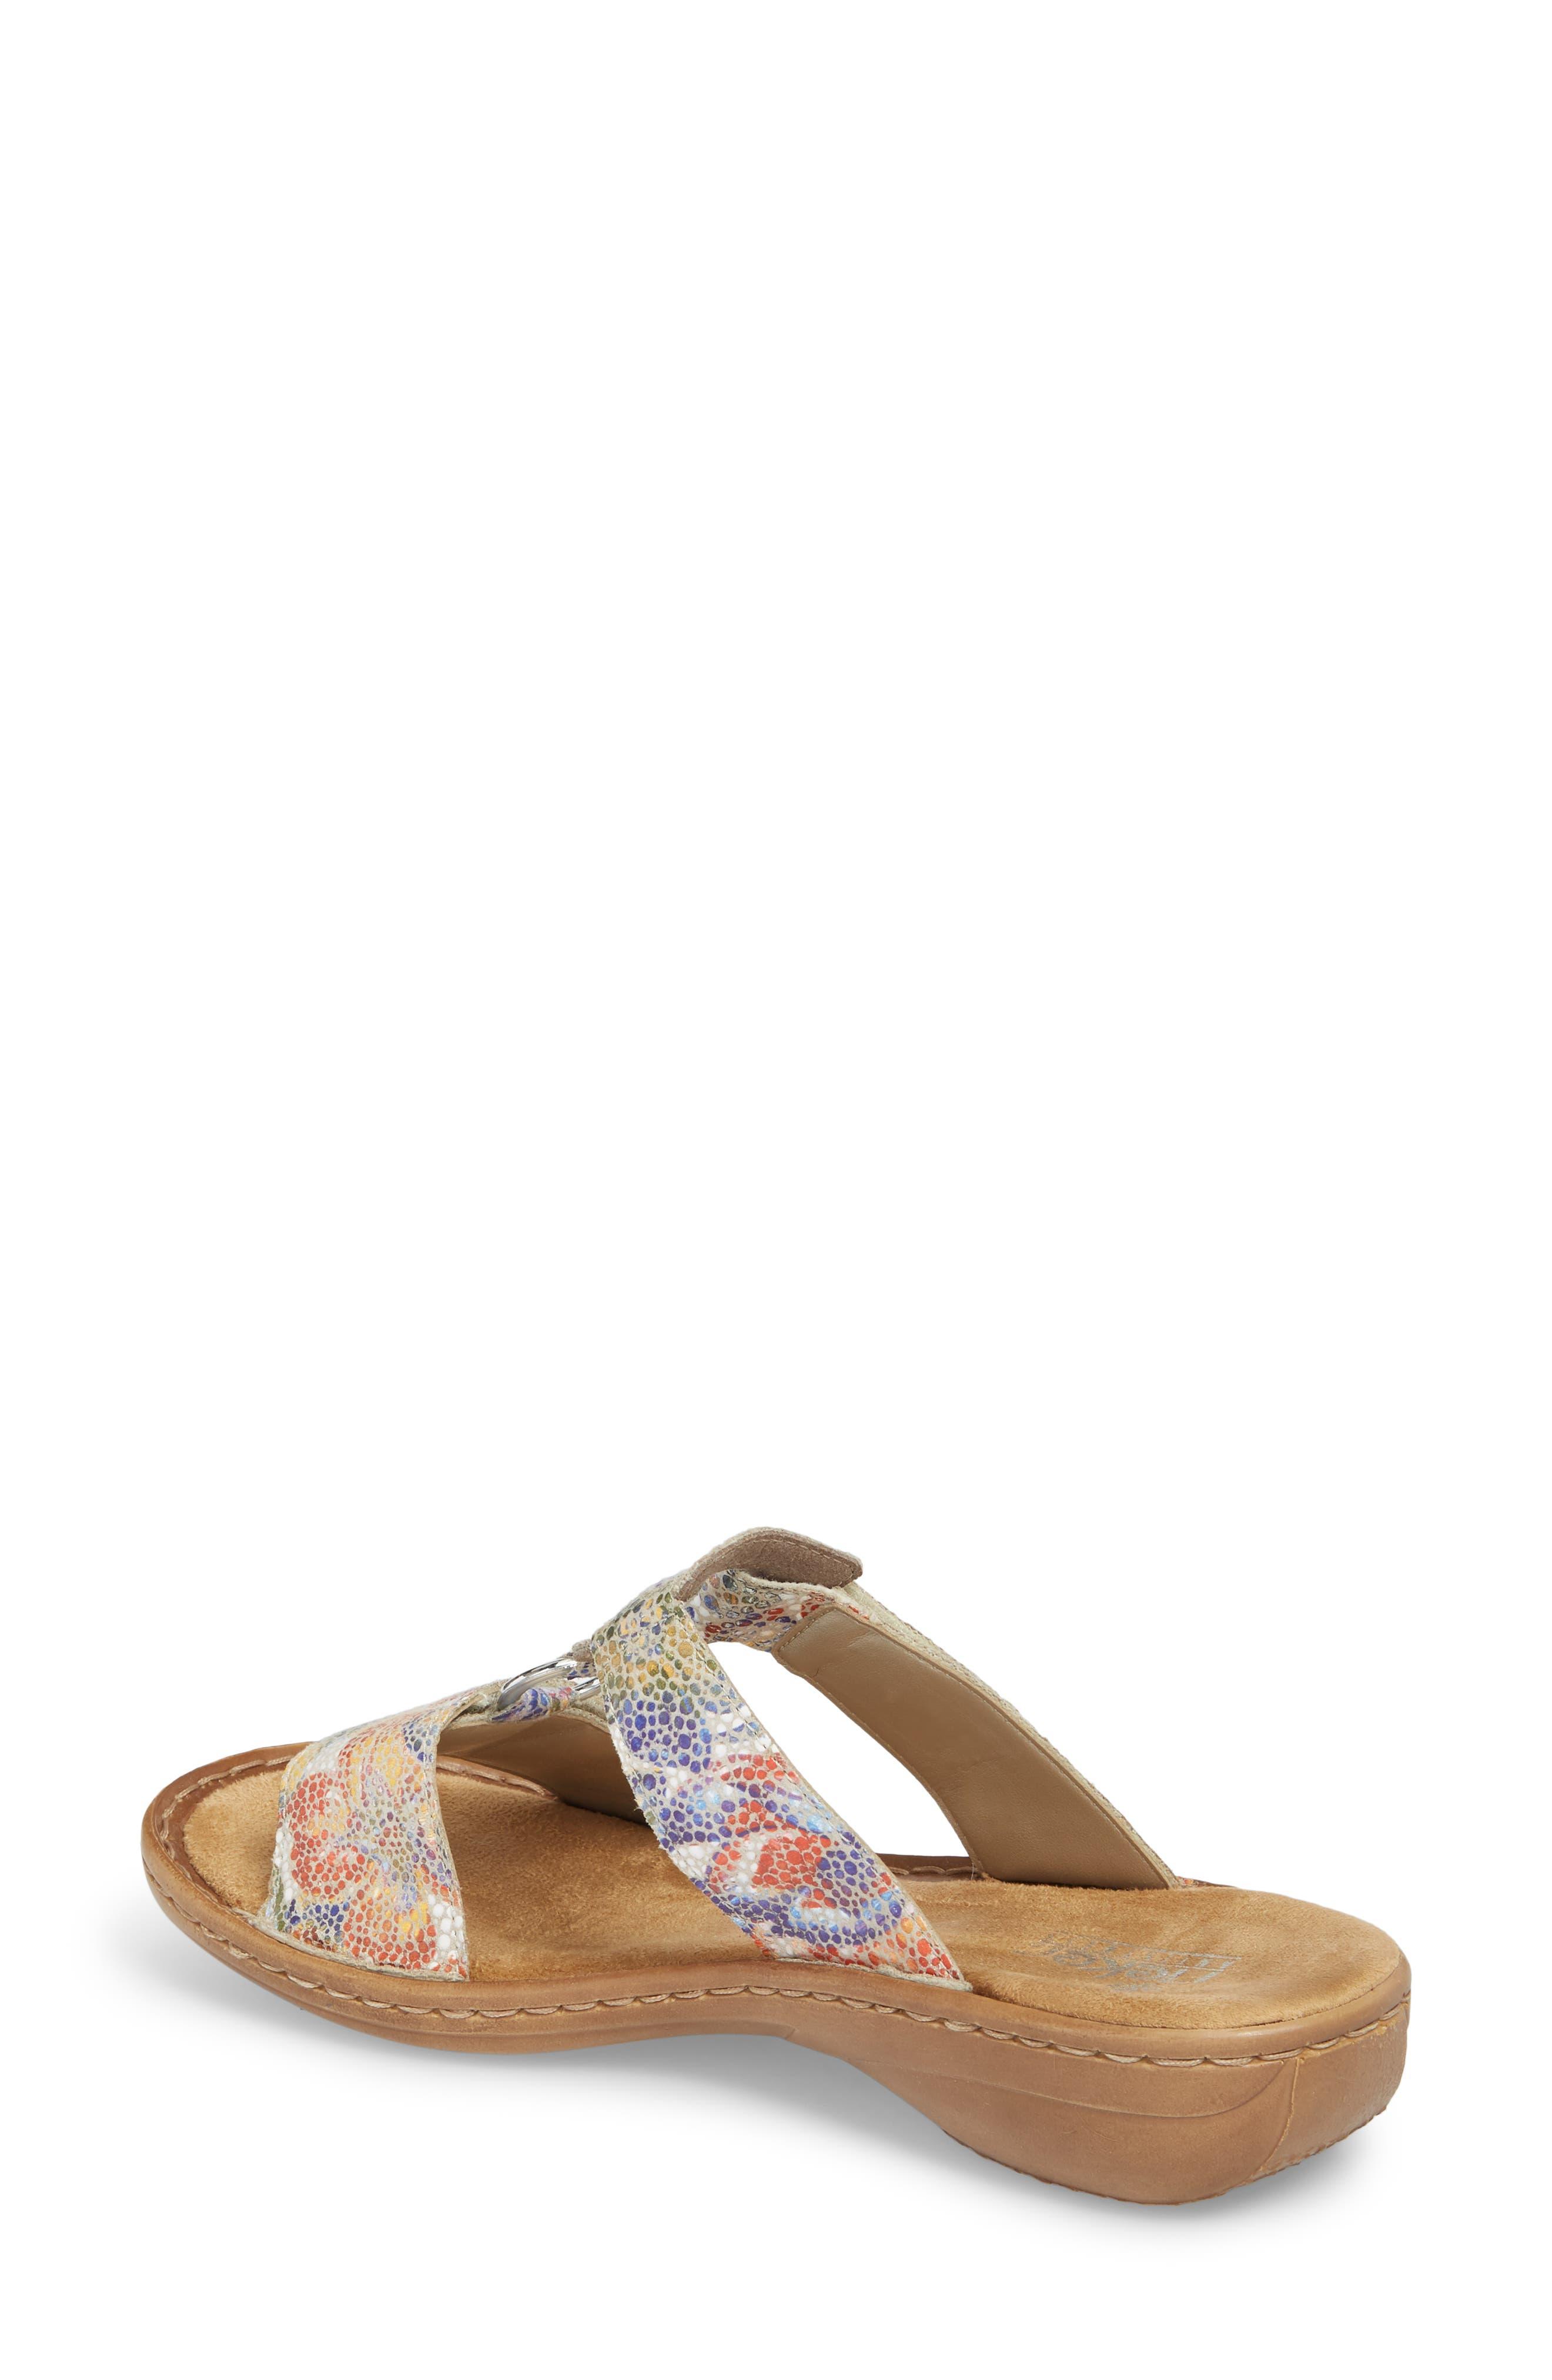 Regina P9 Slide Sandal,                             Alternate thumbnail 2, color,                             WHITE MULTI FABRIC